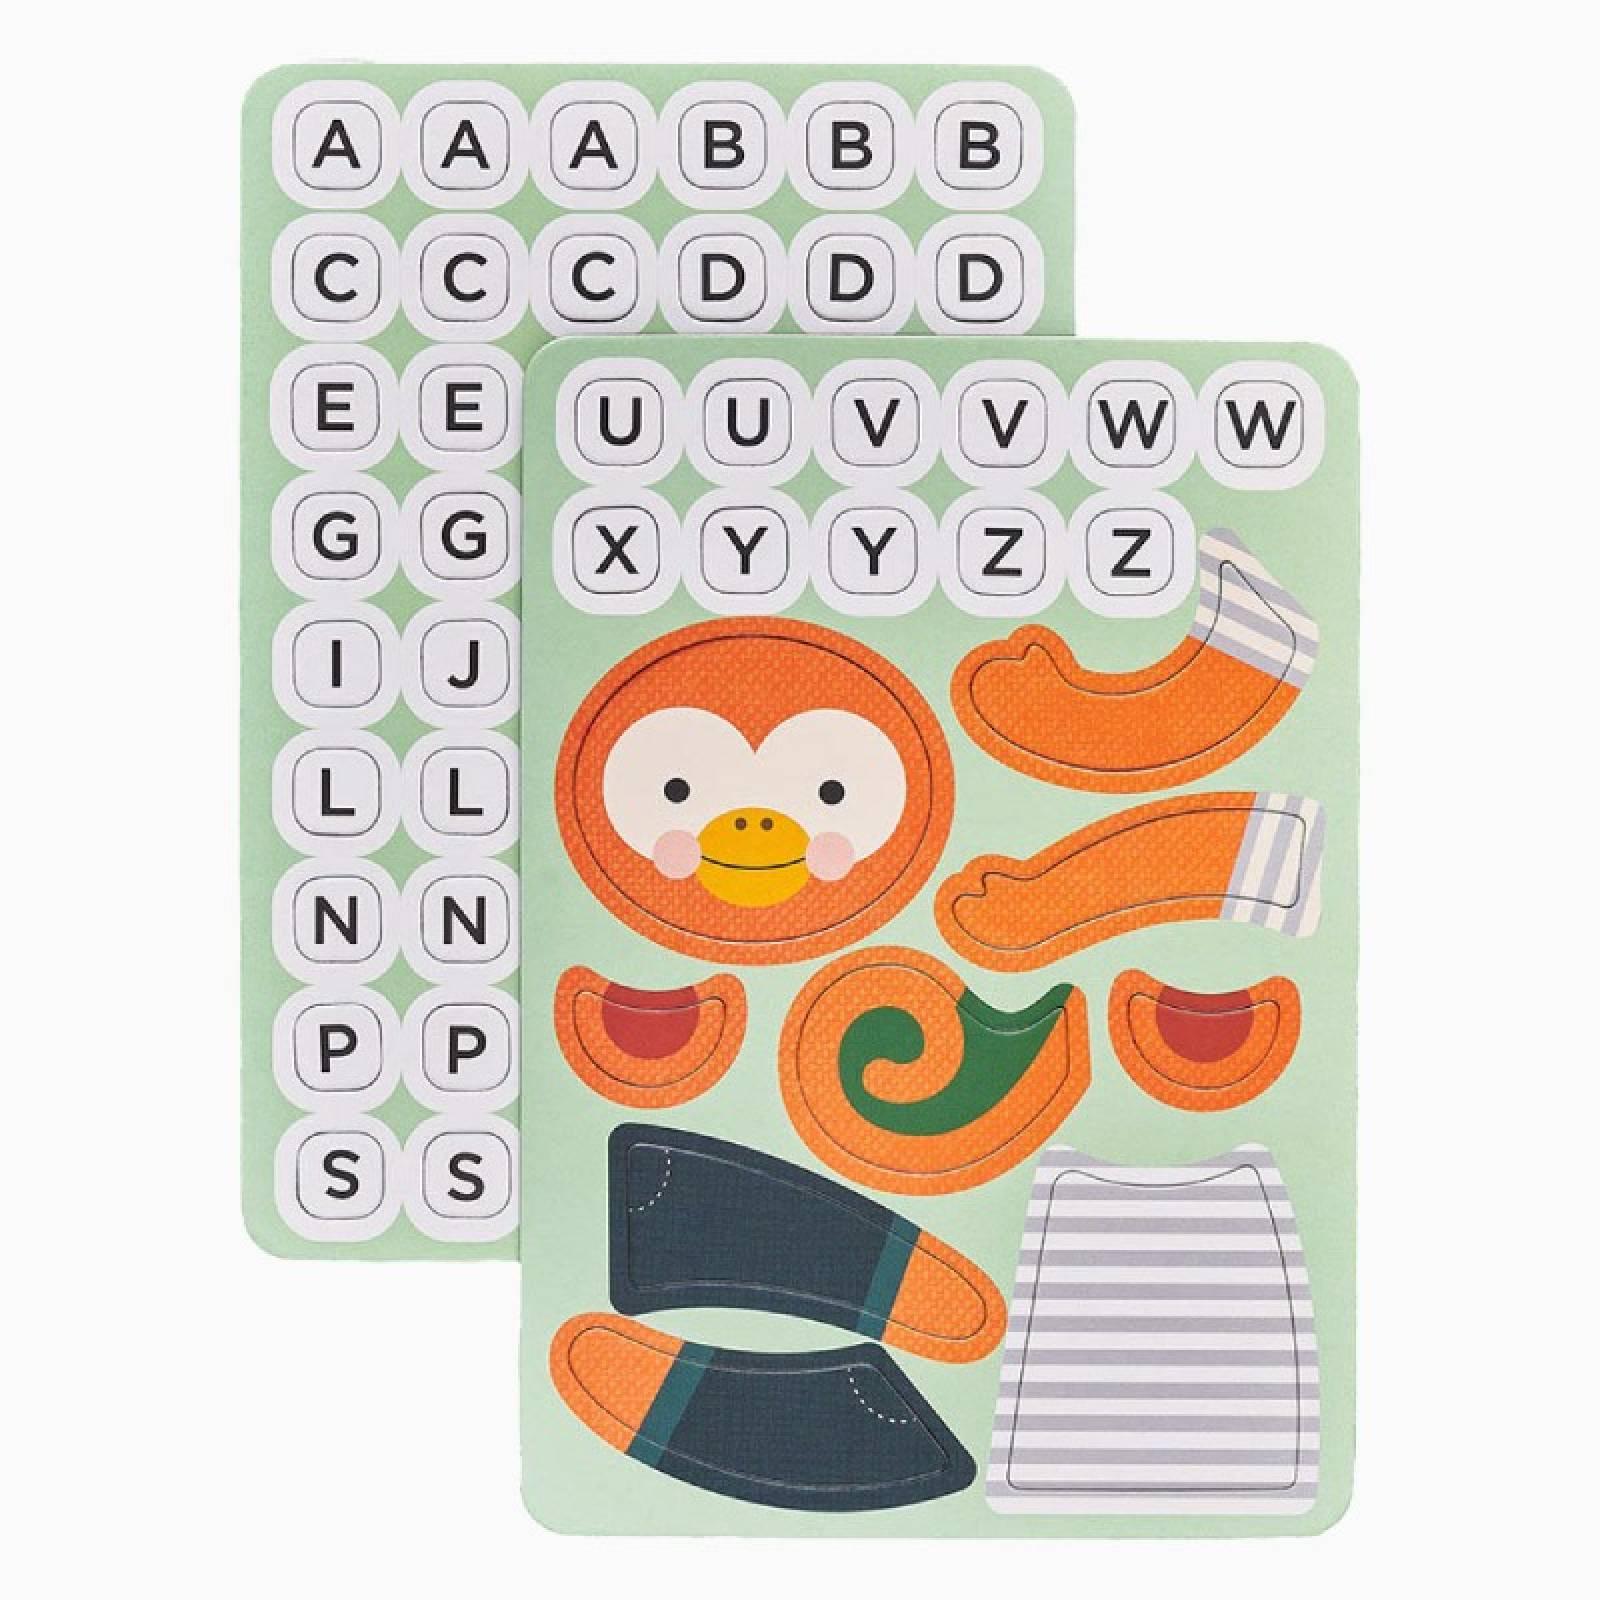 Hang On Monkey - Magnetic Travel Game 3+ thumbnails